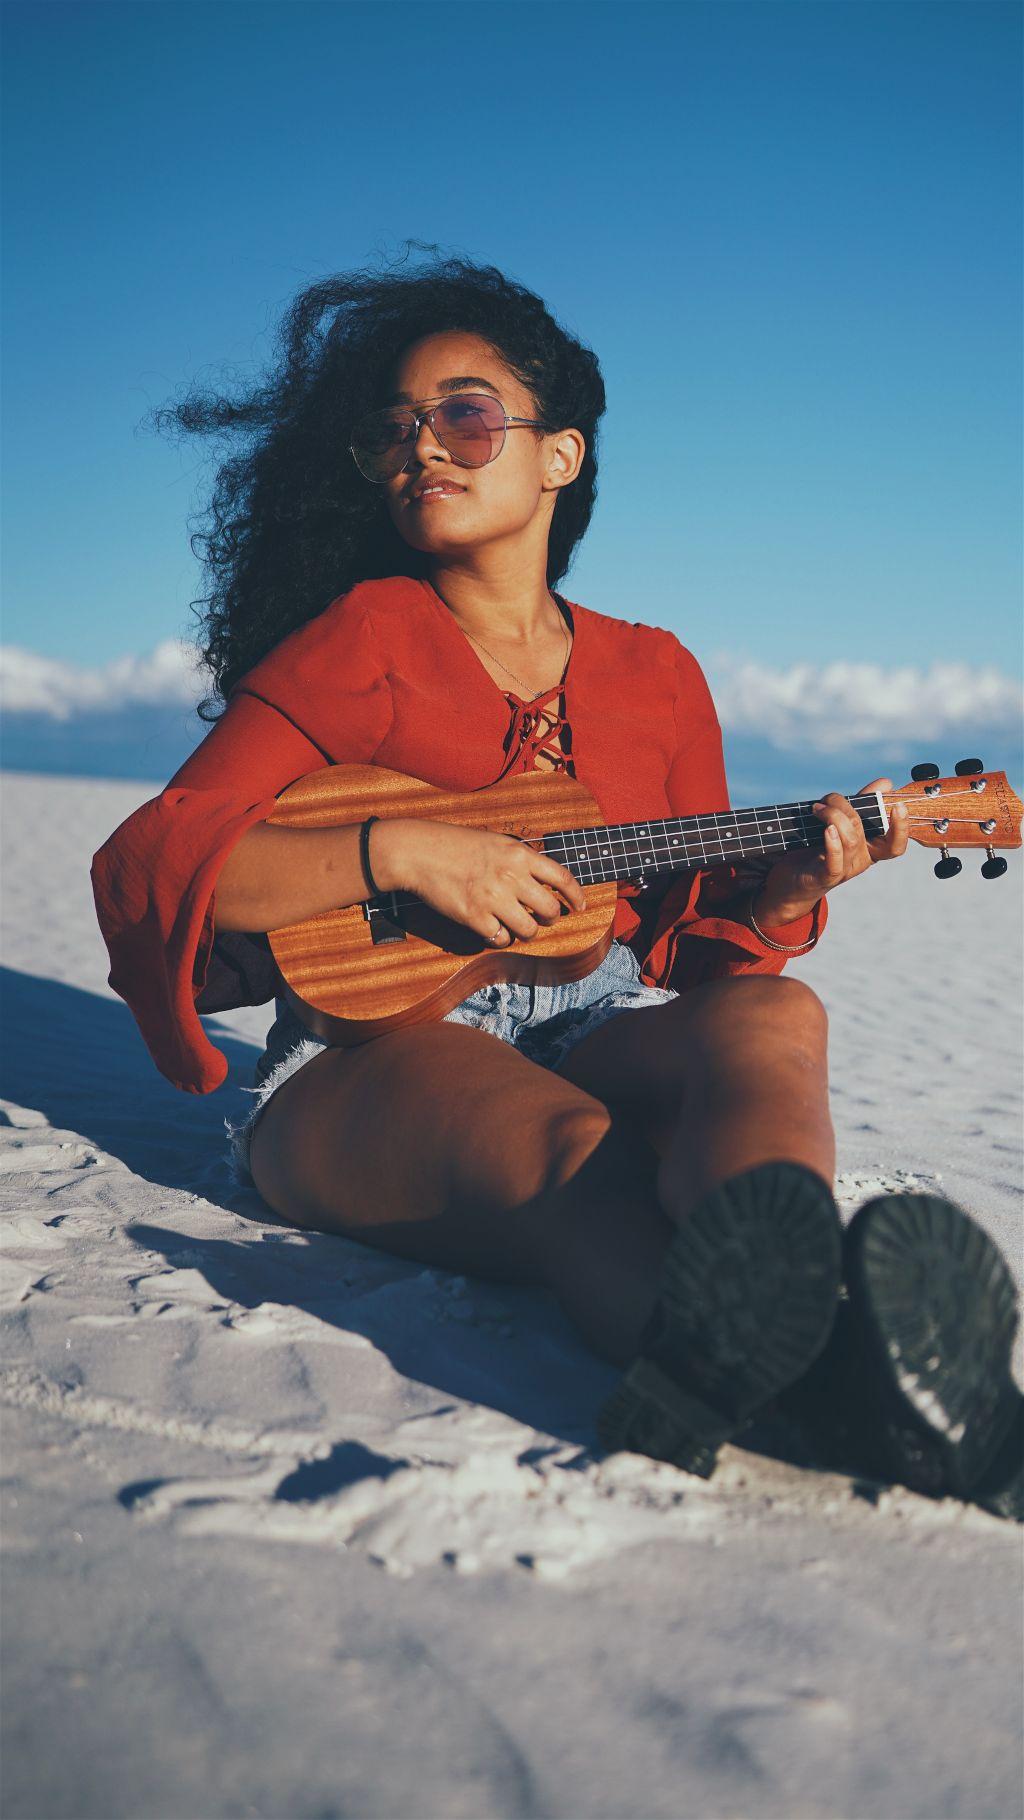 Create a magical remix! Unsplash (Public Domain) #freetoedit #girl #guitar #outdoor #wind #nature